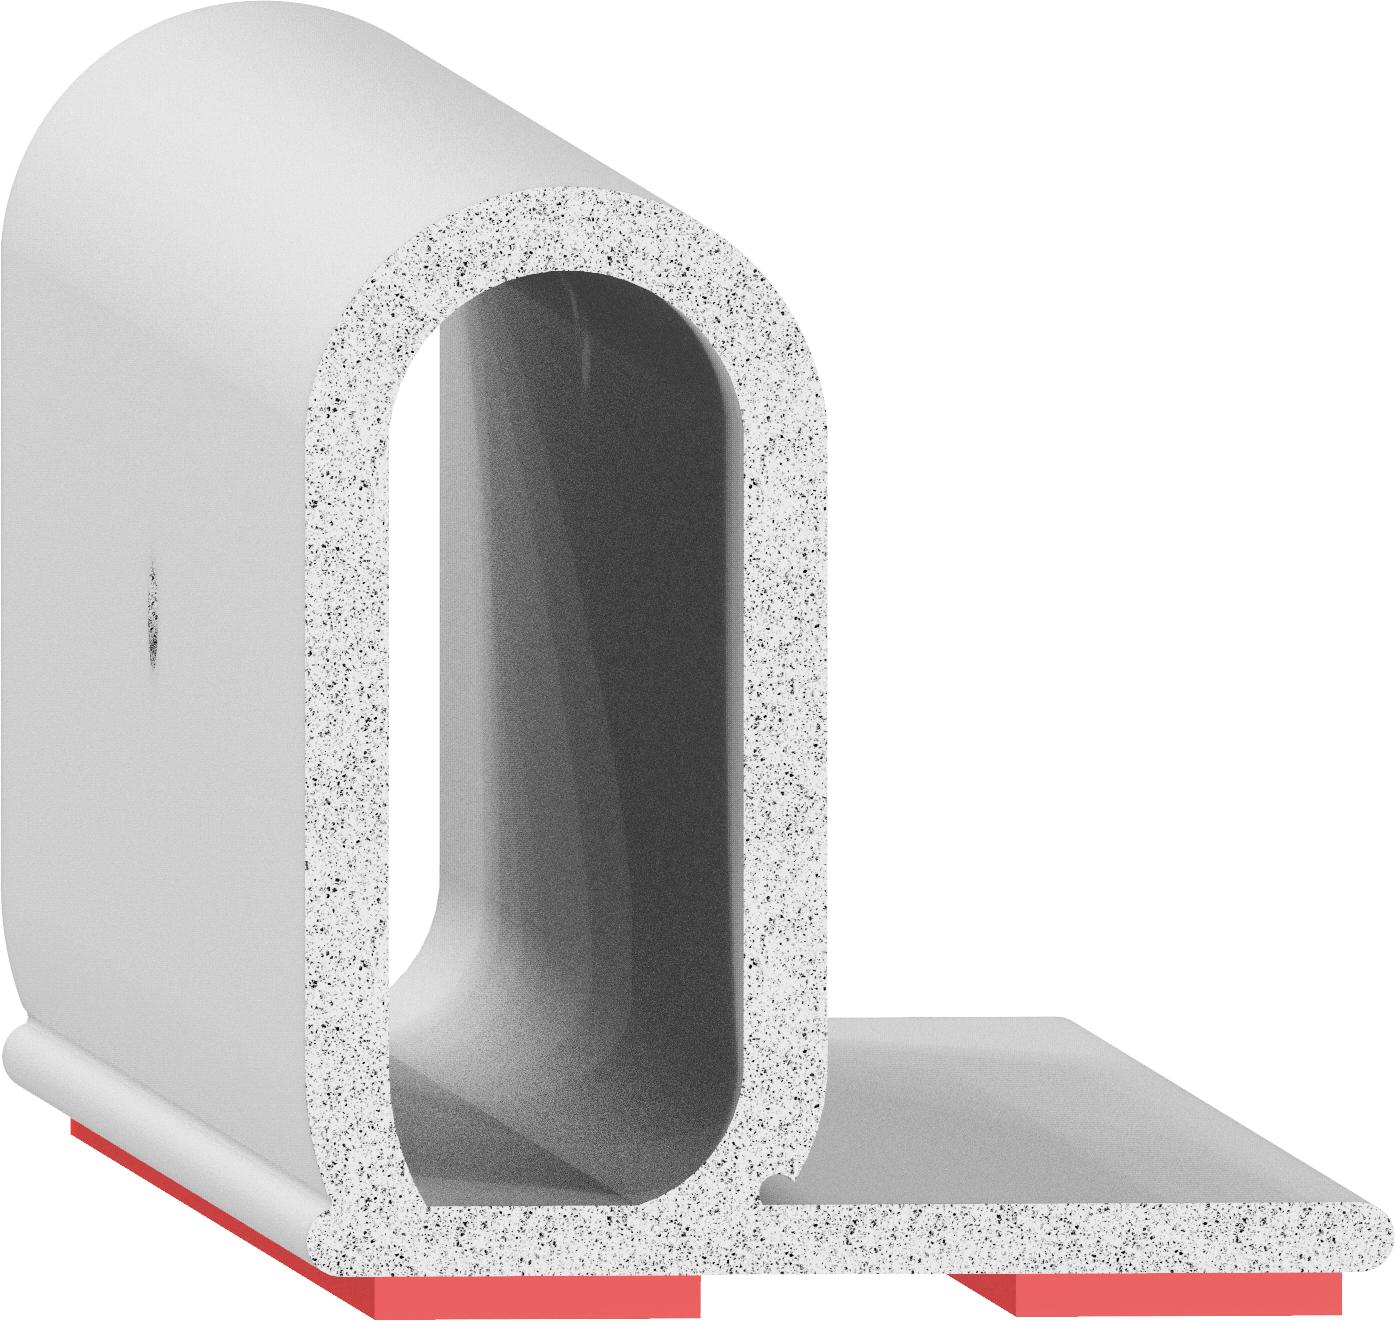 Uni-Grip part: TR-504-T-WT 2 X Tape